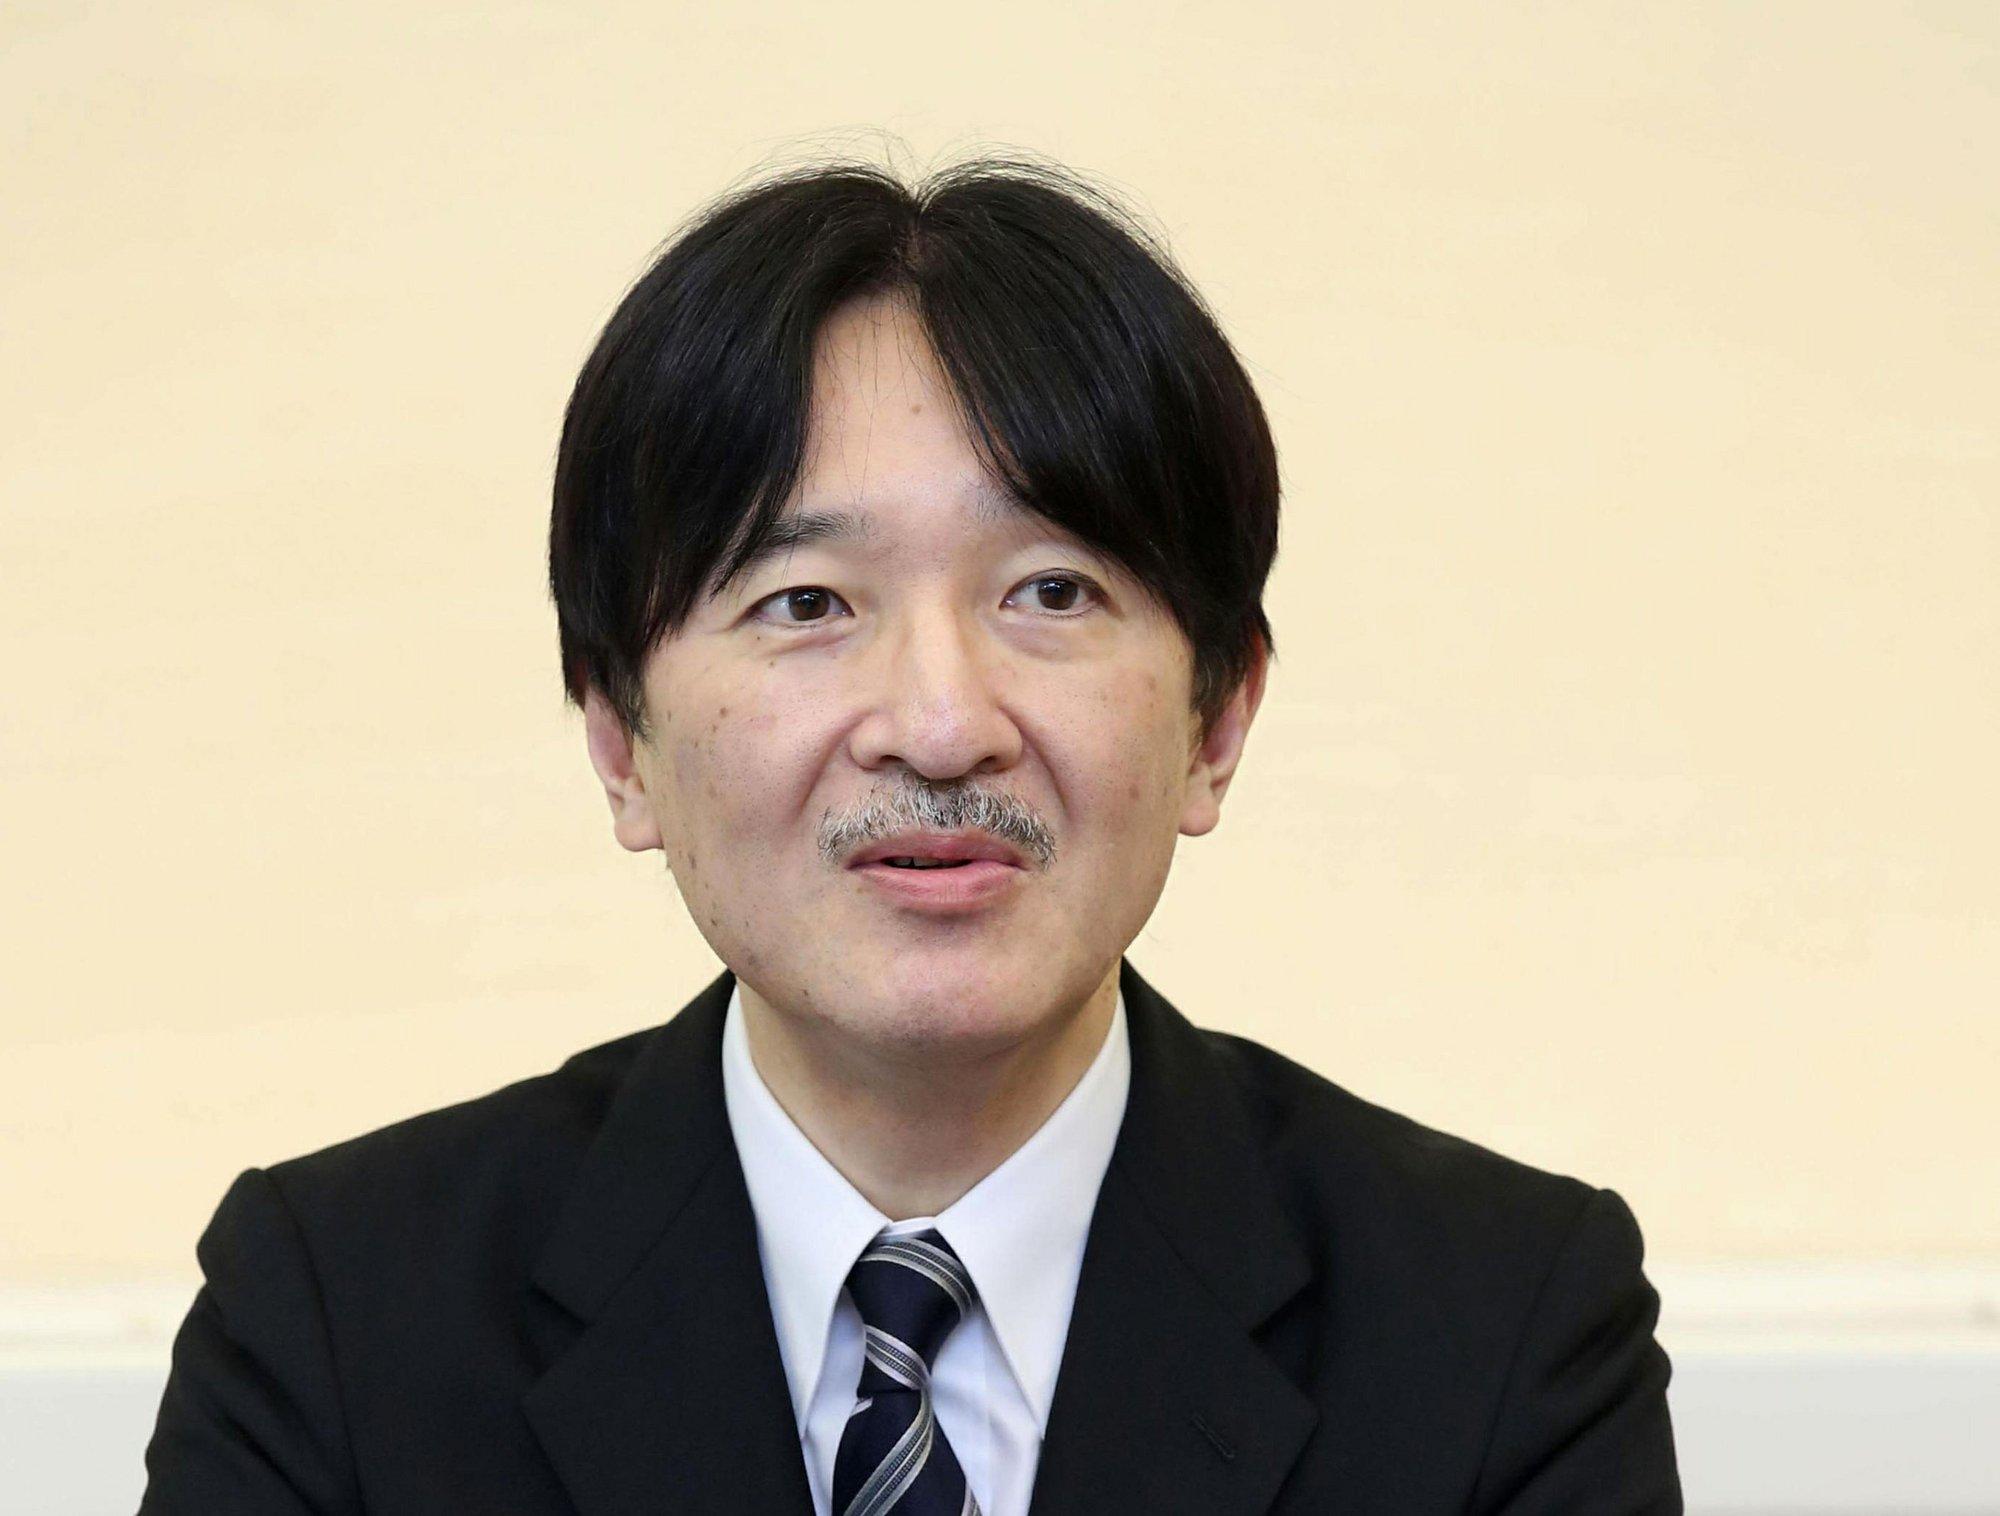 Japan prince: Royal duties need review as members decline